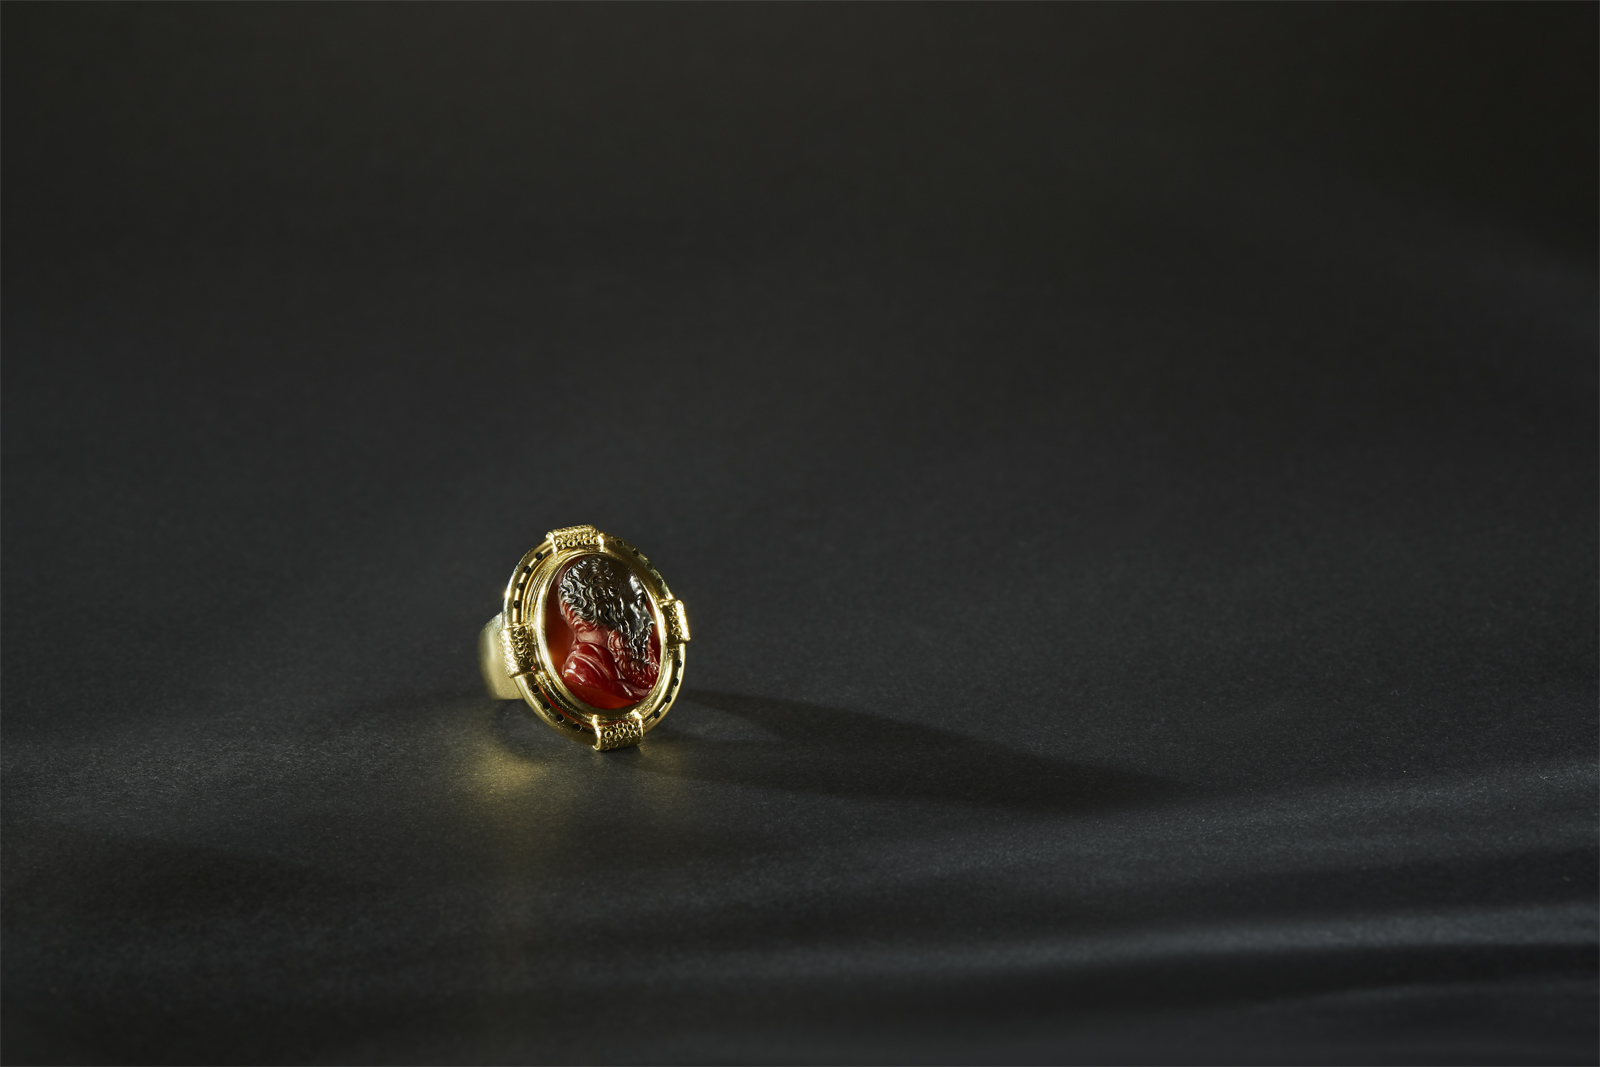 Elizabeth's April Highlight: Historical Treasures